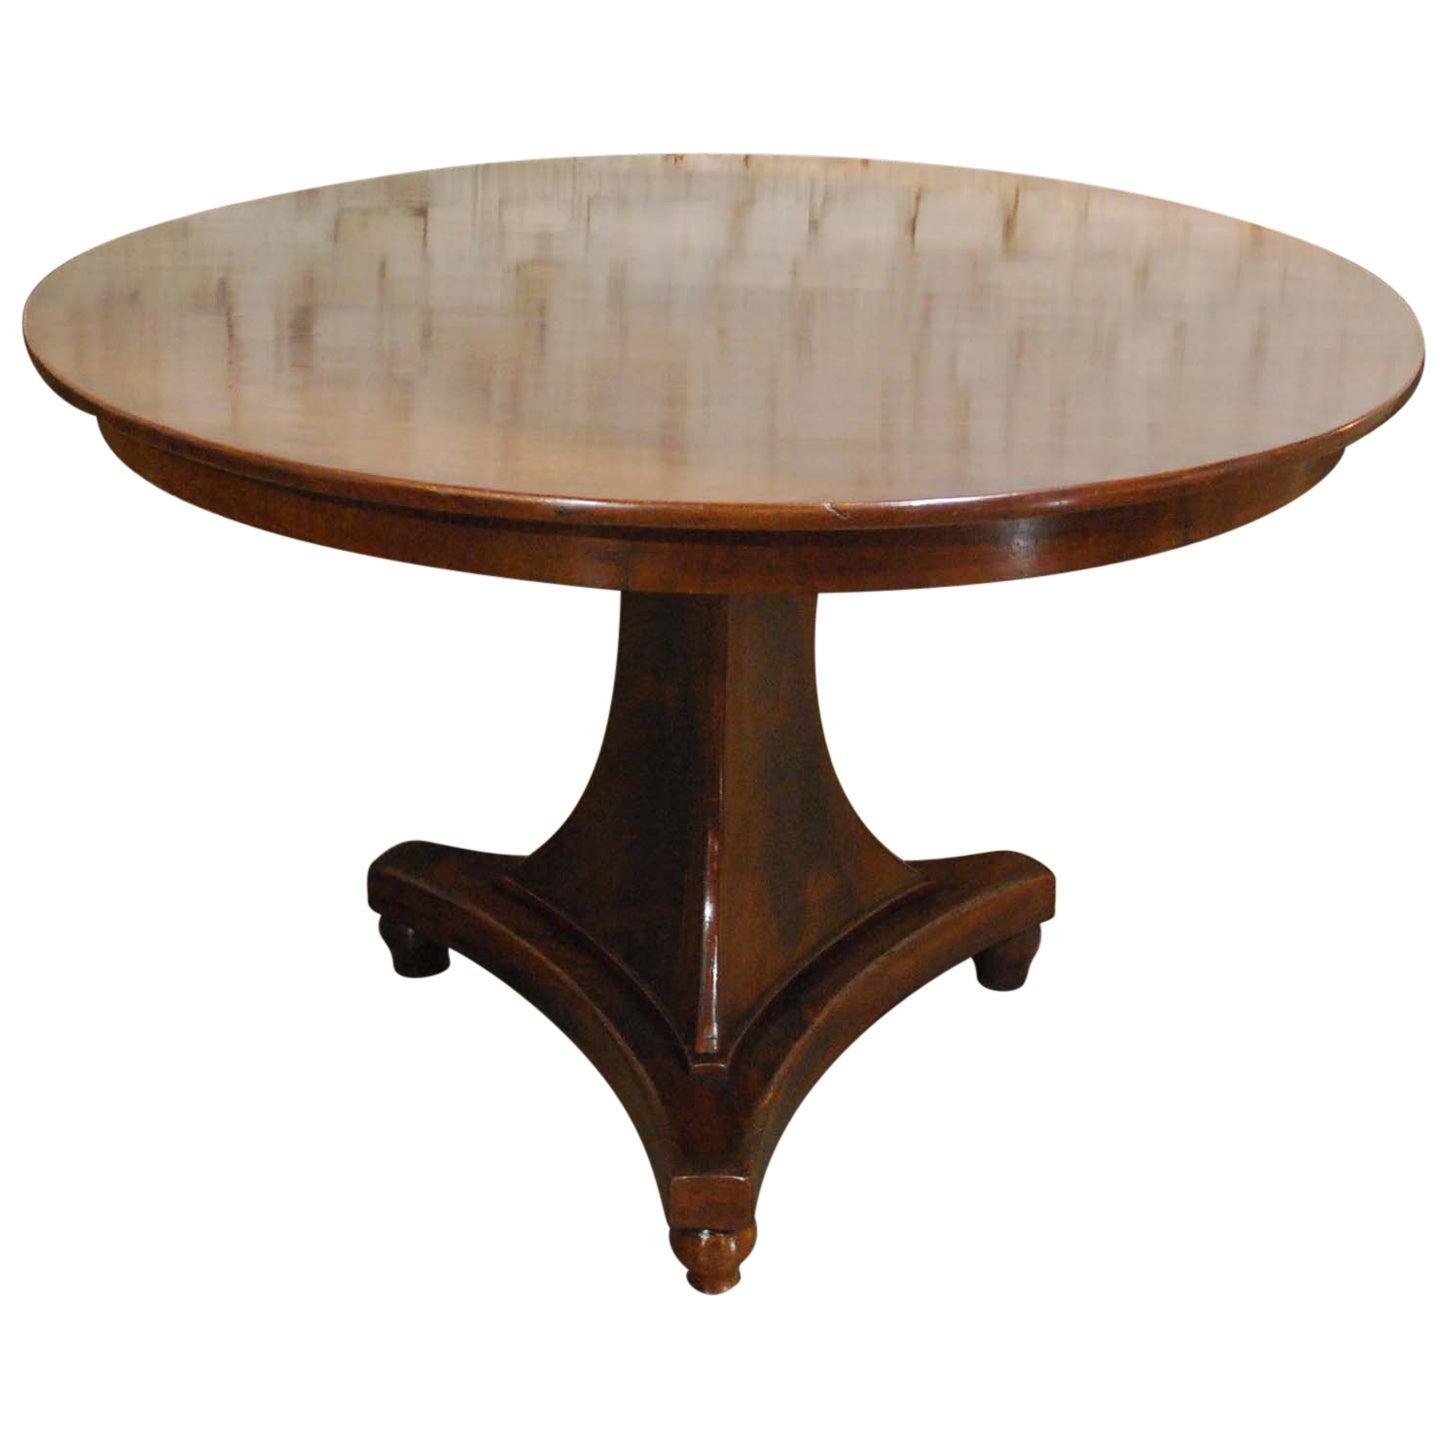 Antique 19th Century Empire Dutch Mahogany Round Dining Table